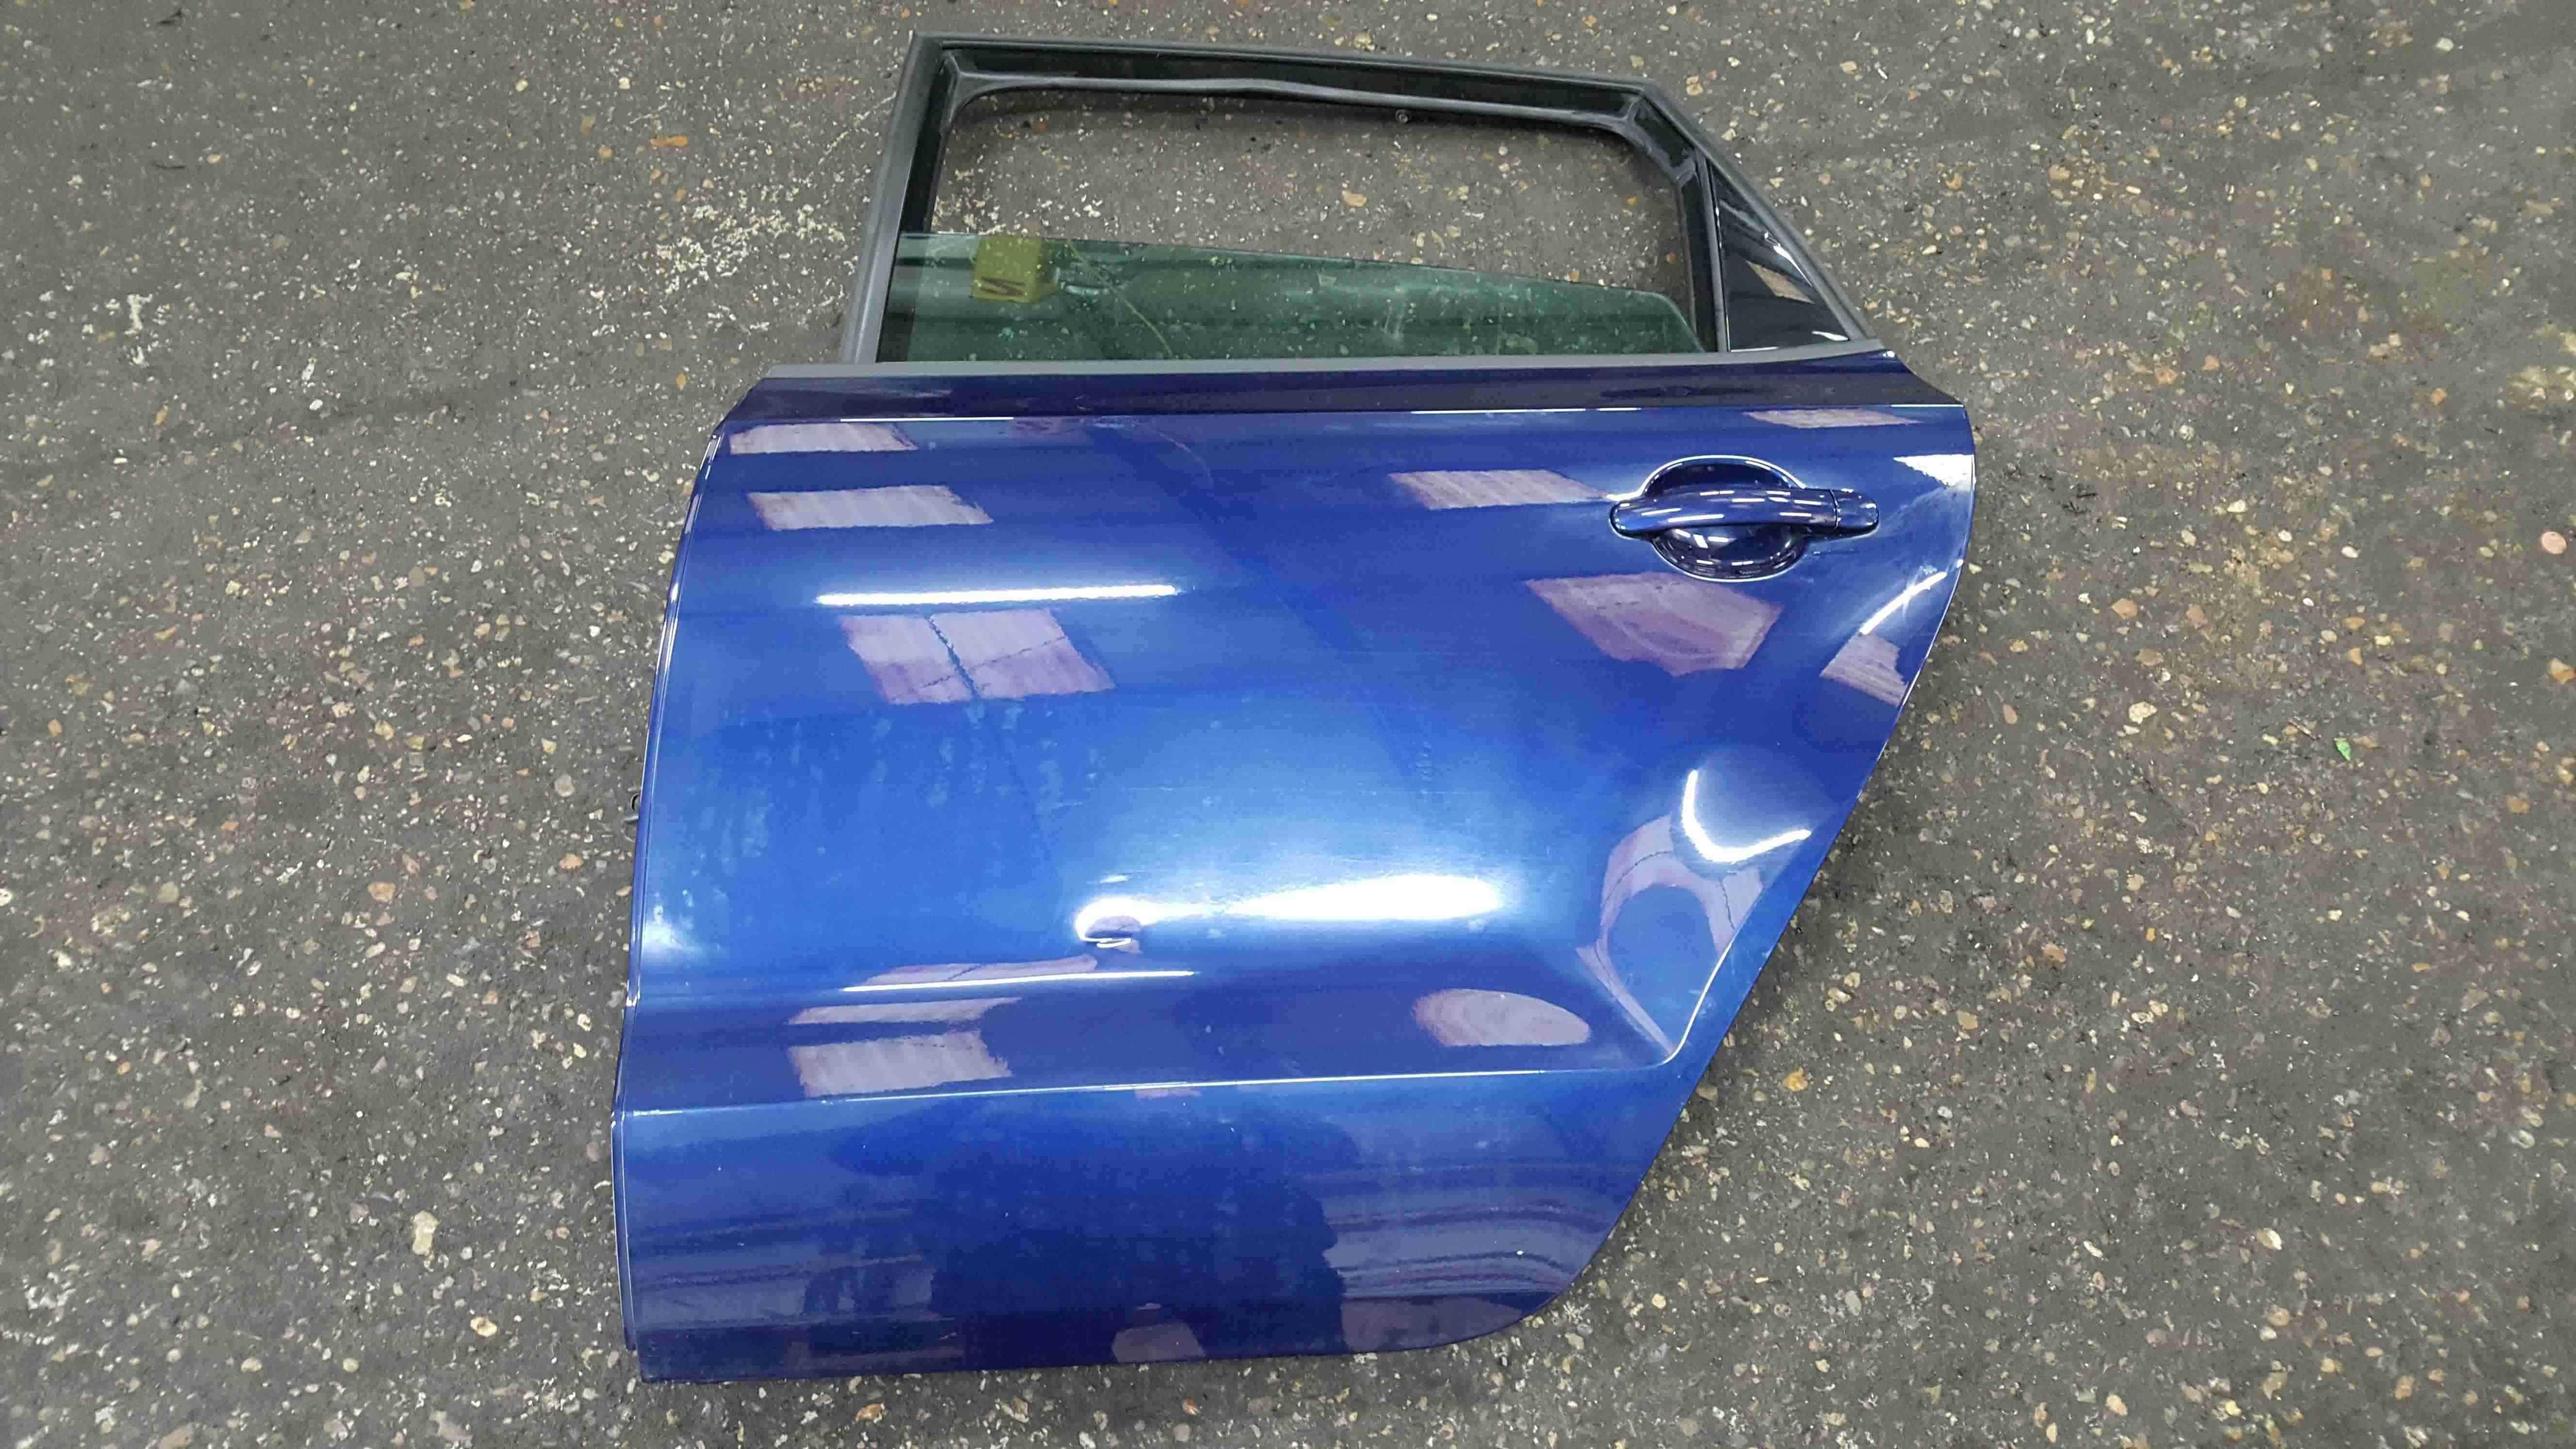 Volkswagen Polo 6R 2009-2014 Passenger NSR Rear Door Blue LD5Q 5dr